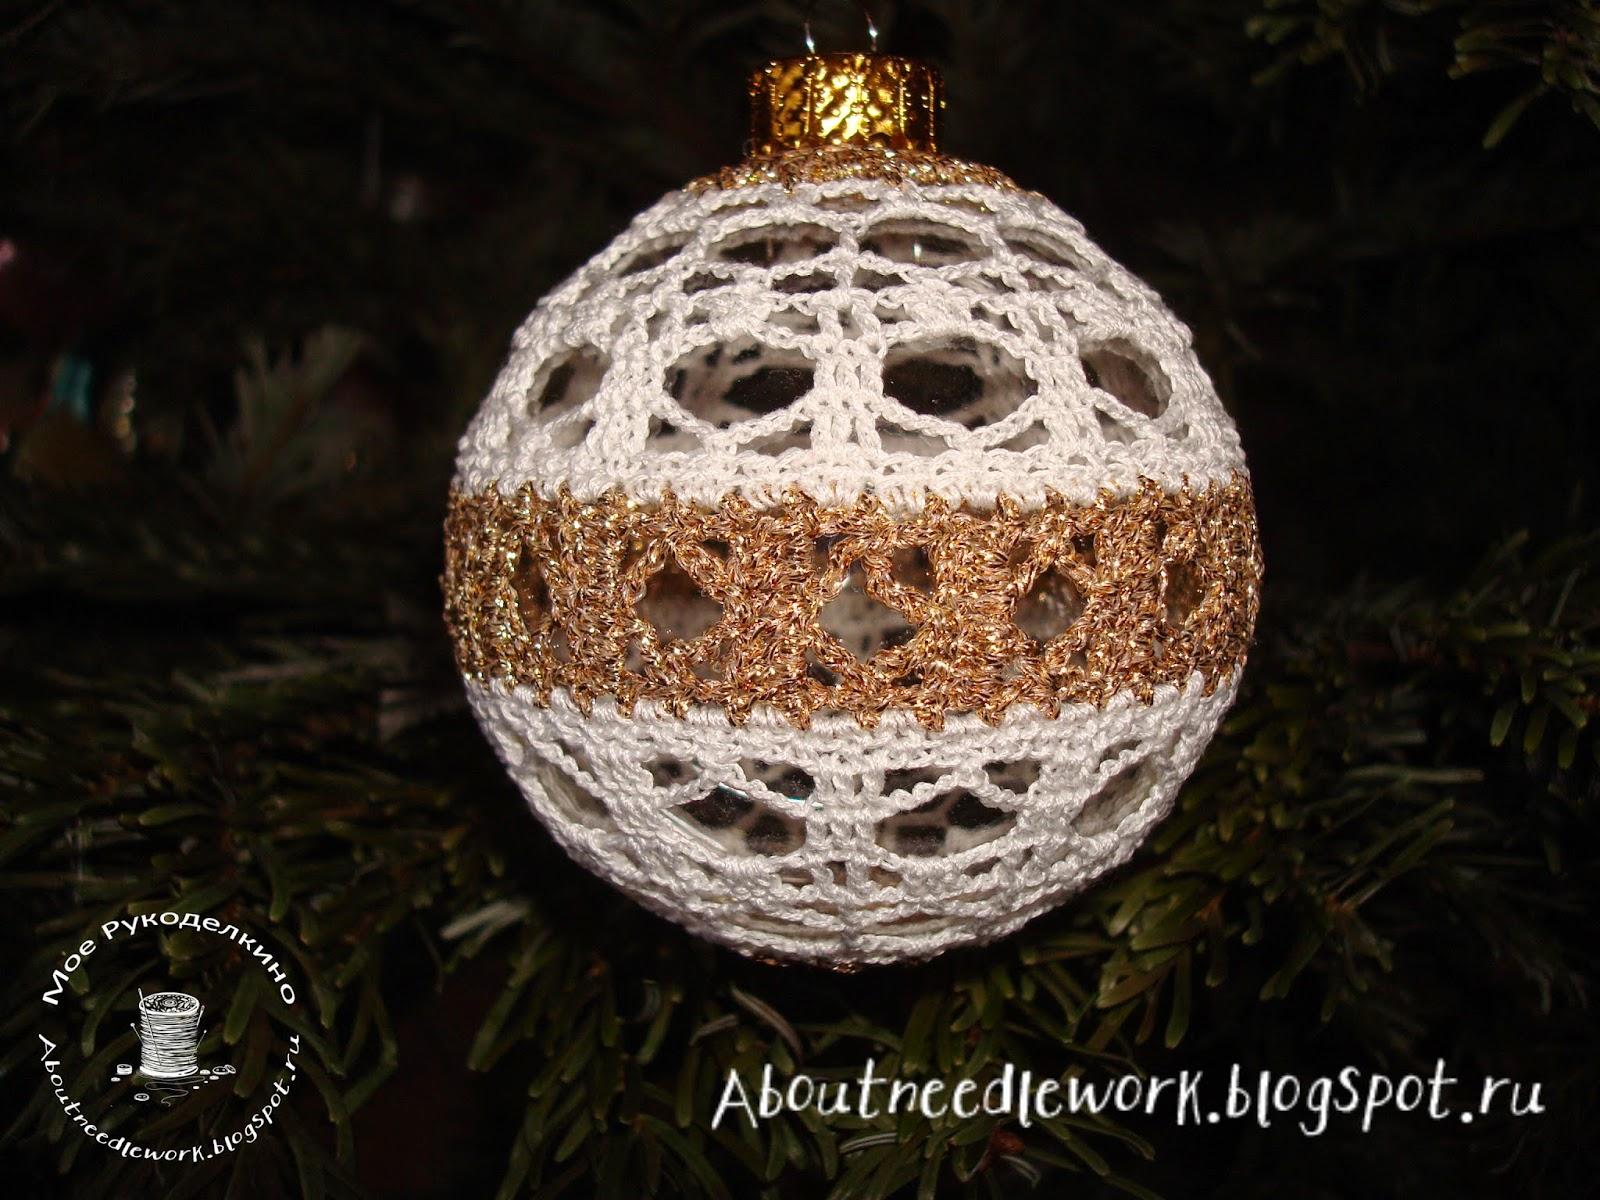 Новогодний шар, обвязанный крючком